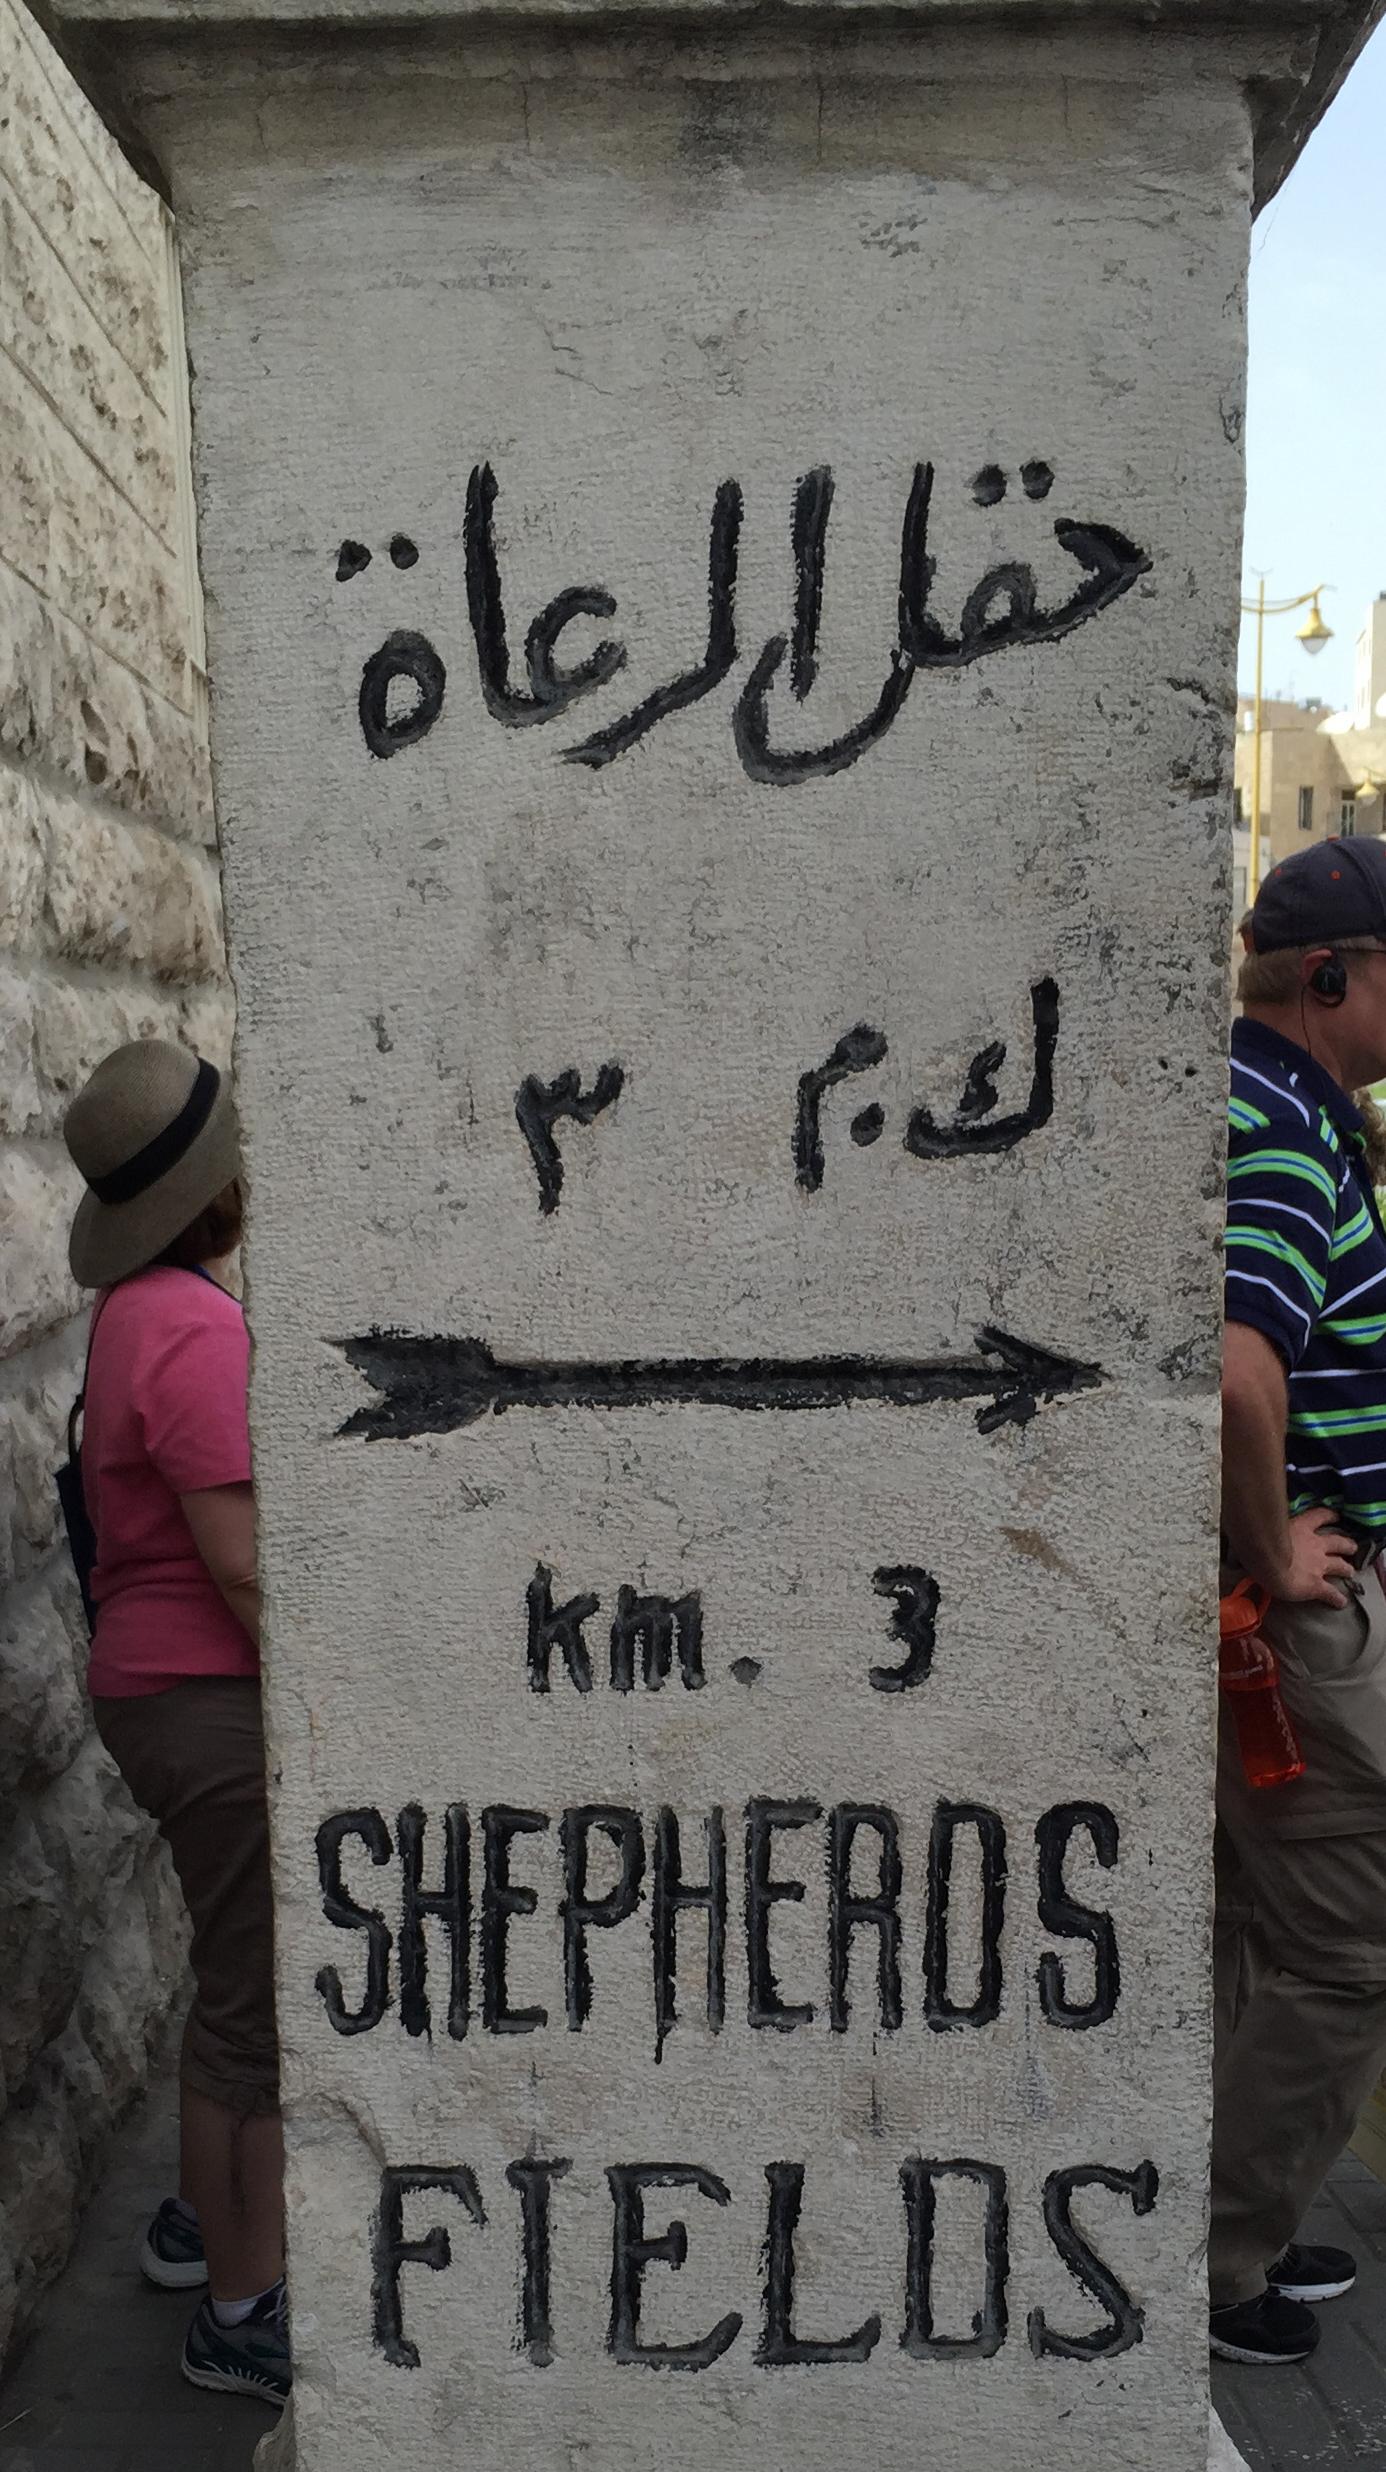 064_shepherds_fields_sign_cropped